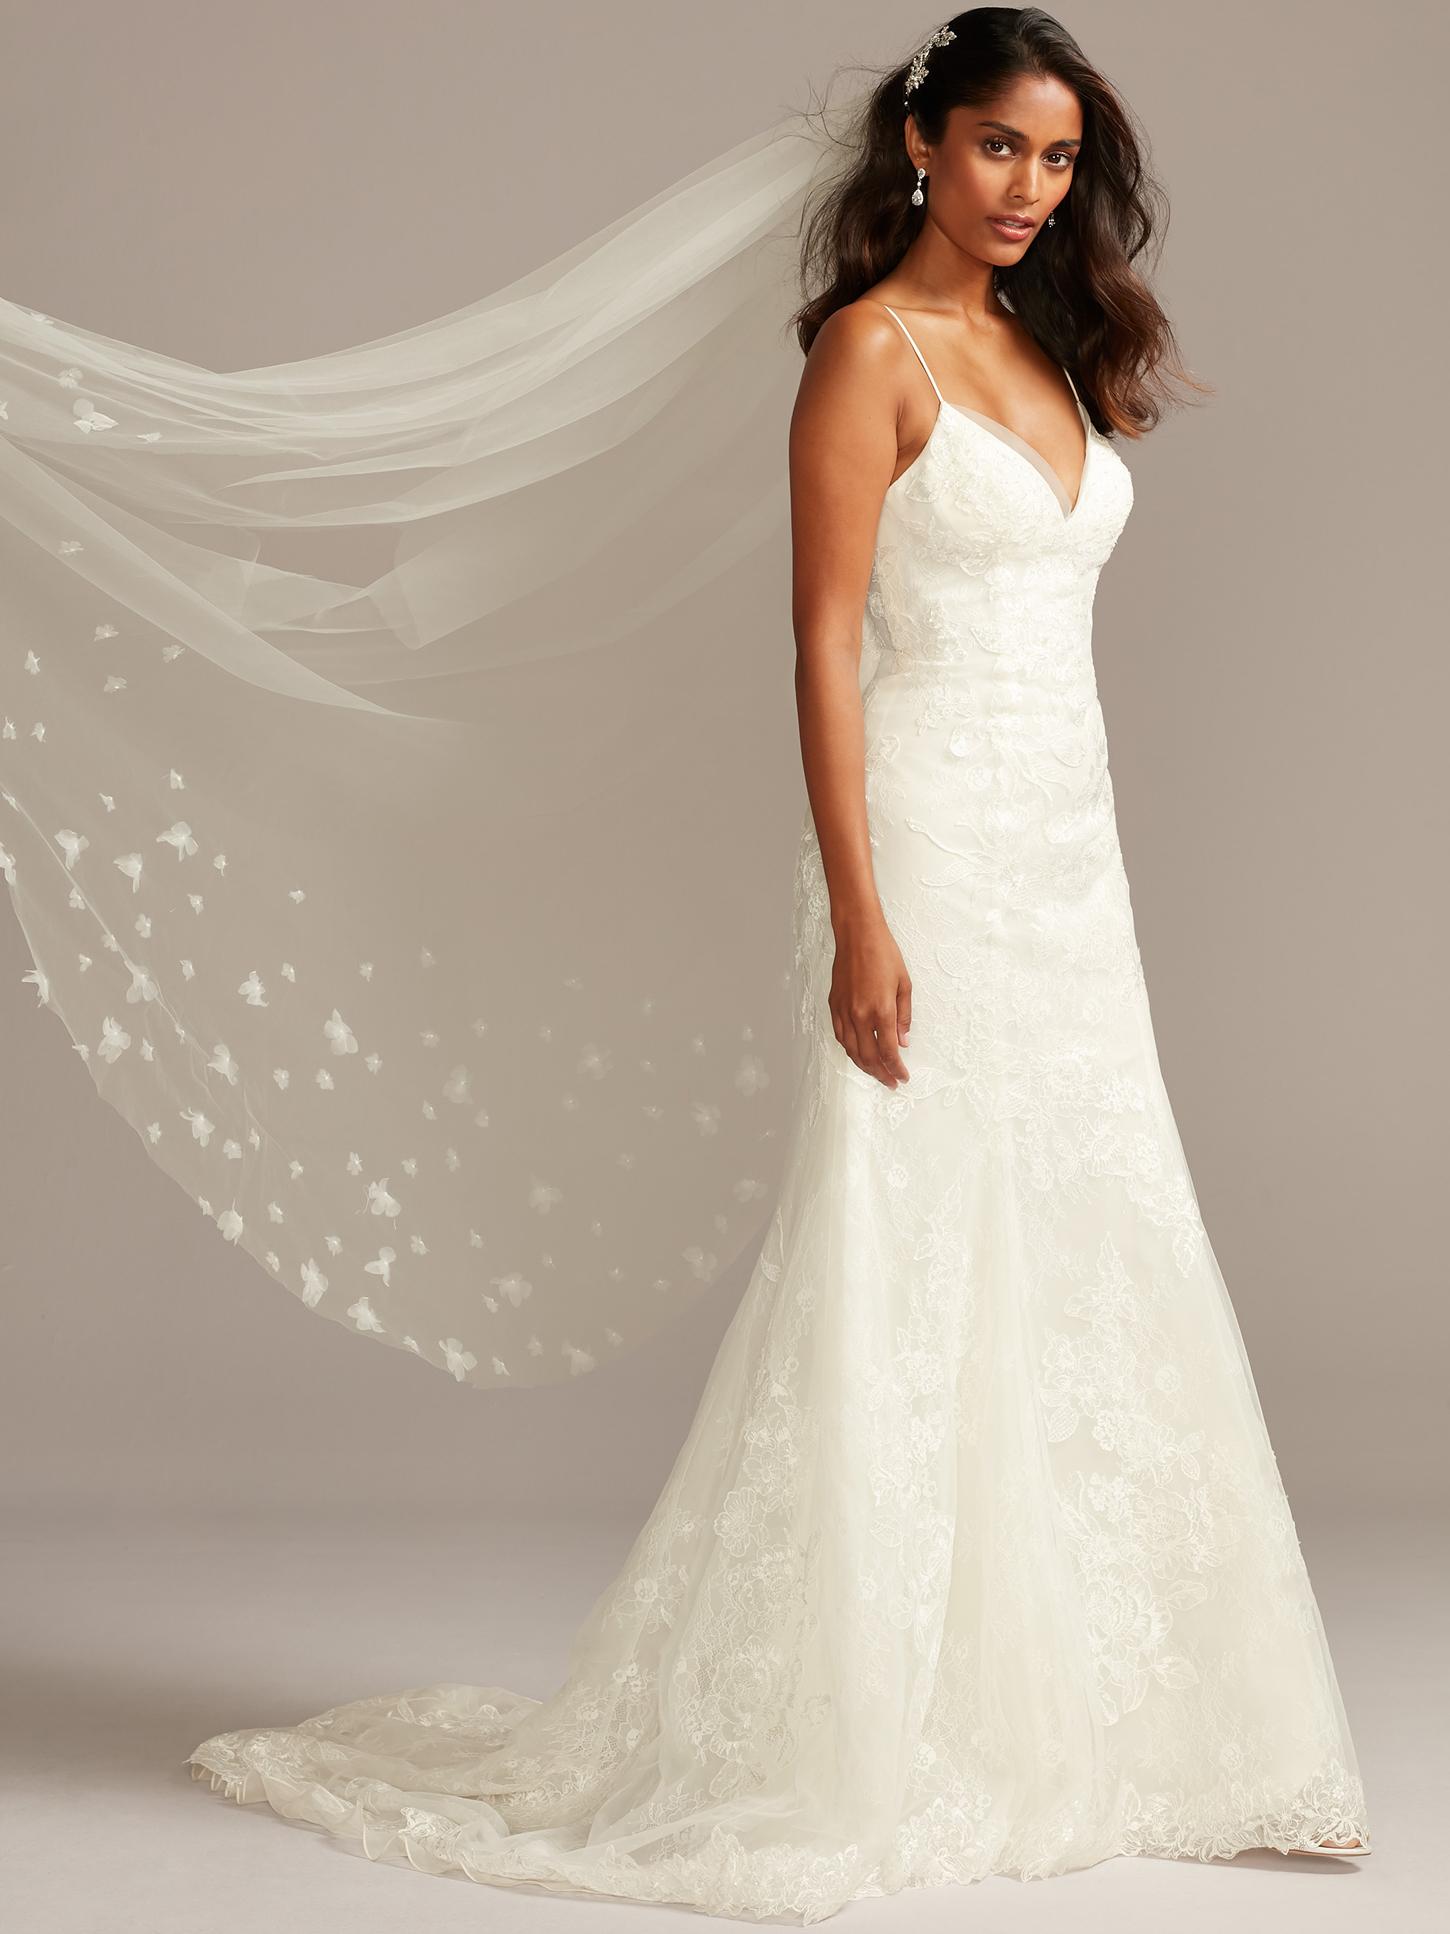 davids bridal deep v-neck spaghetti strap train wedding dress fall 2020